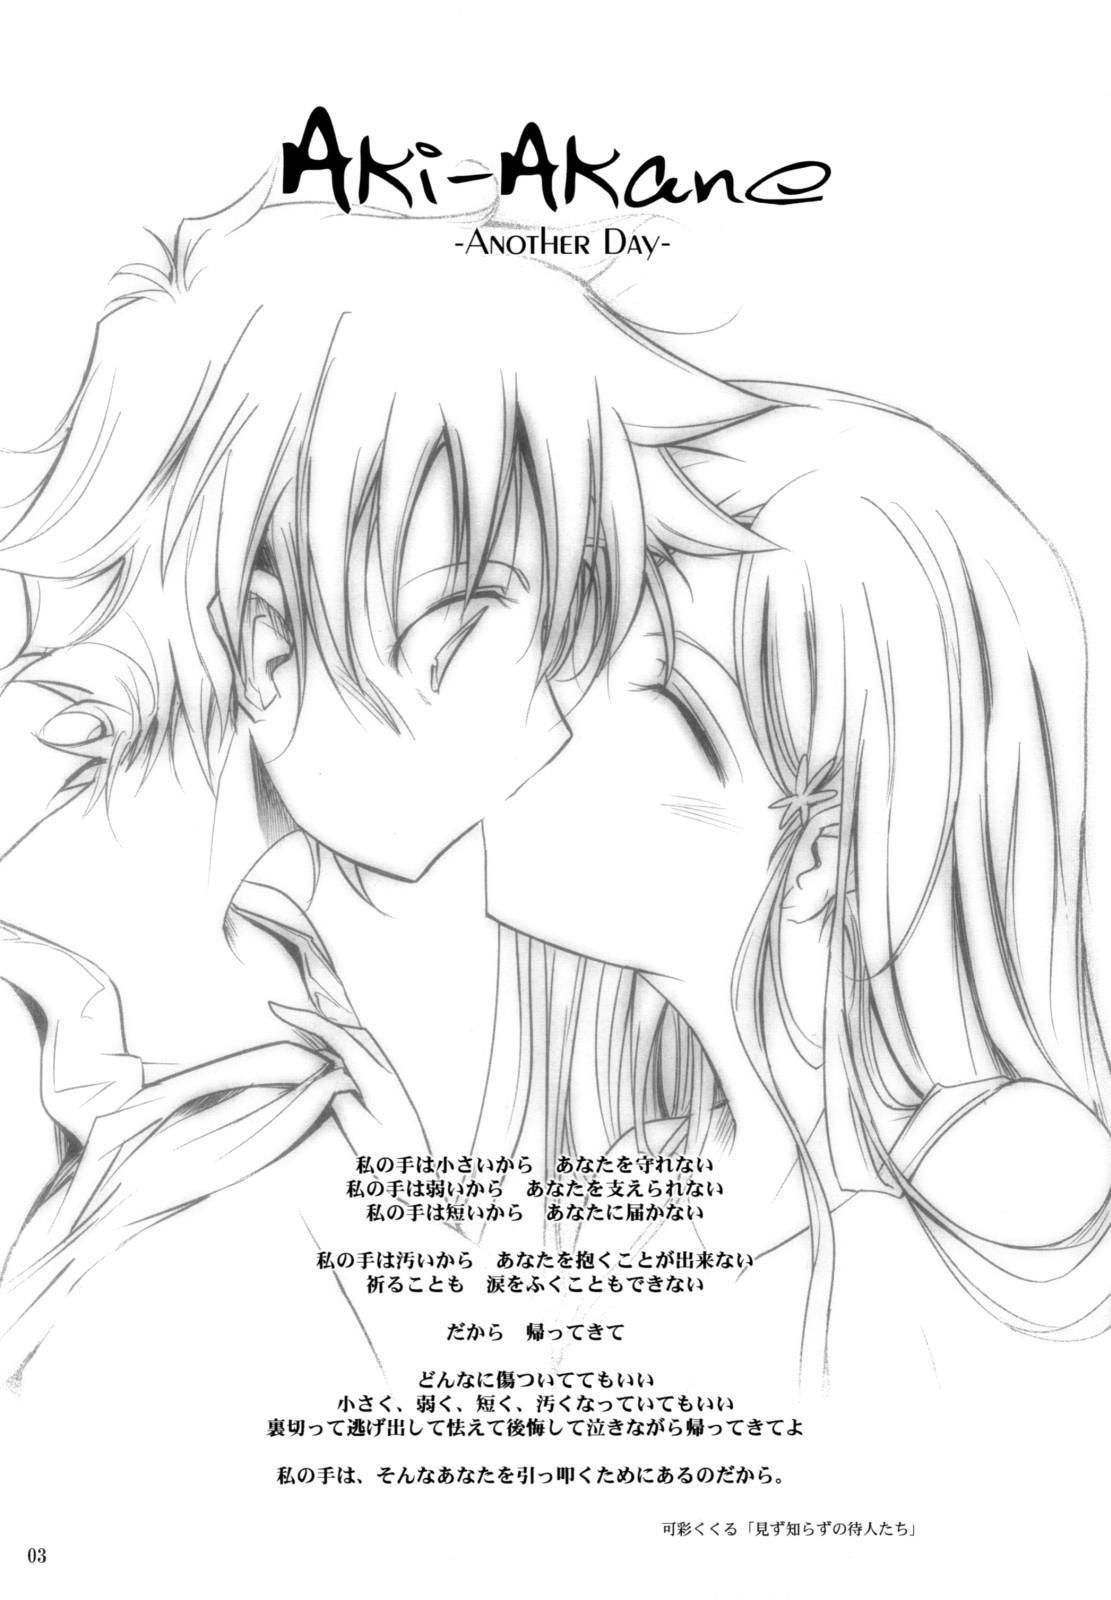 (C74) [Garyuh-Chitai (TANA)] Aki-Akane -ANOTHER DAY- (Bleach) 1